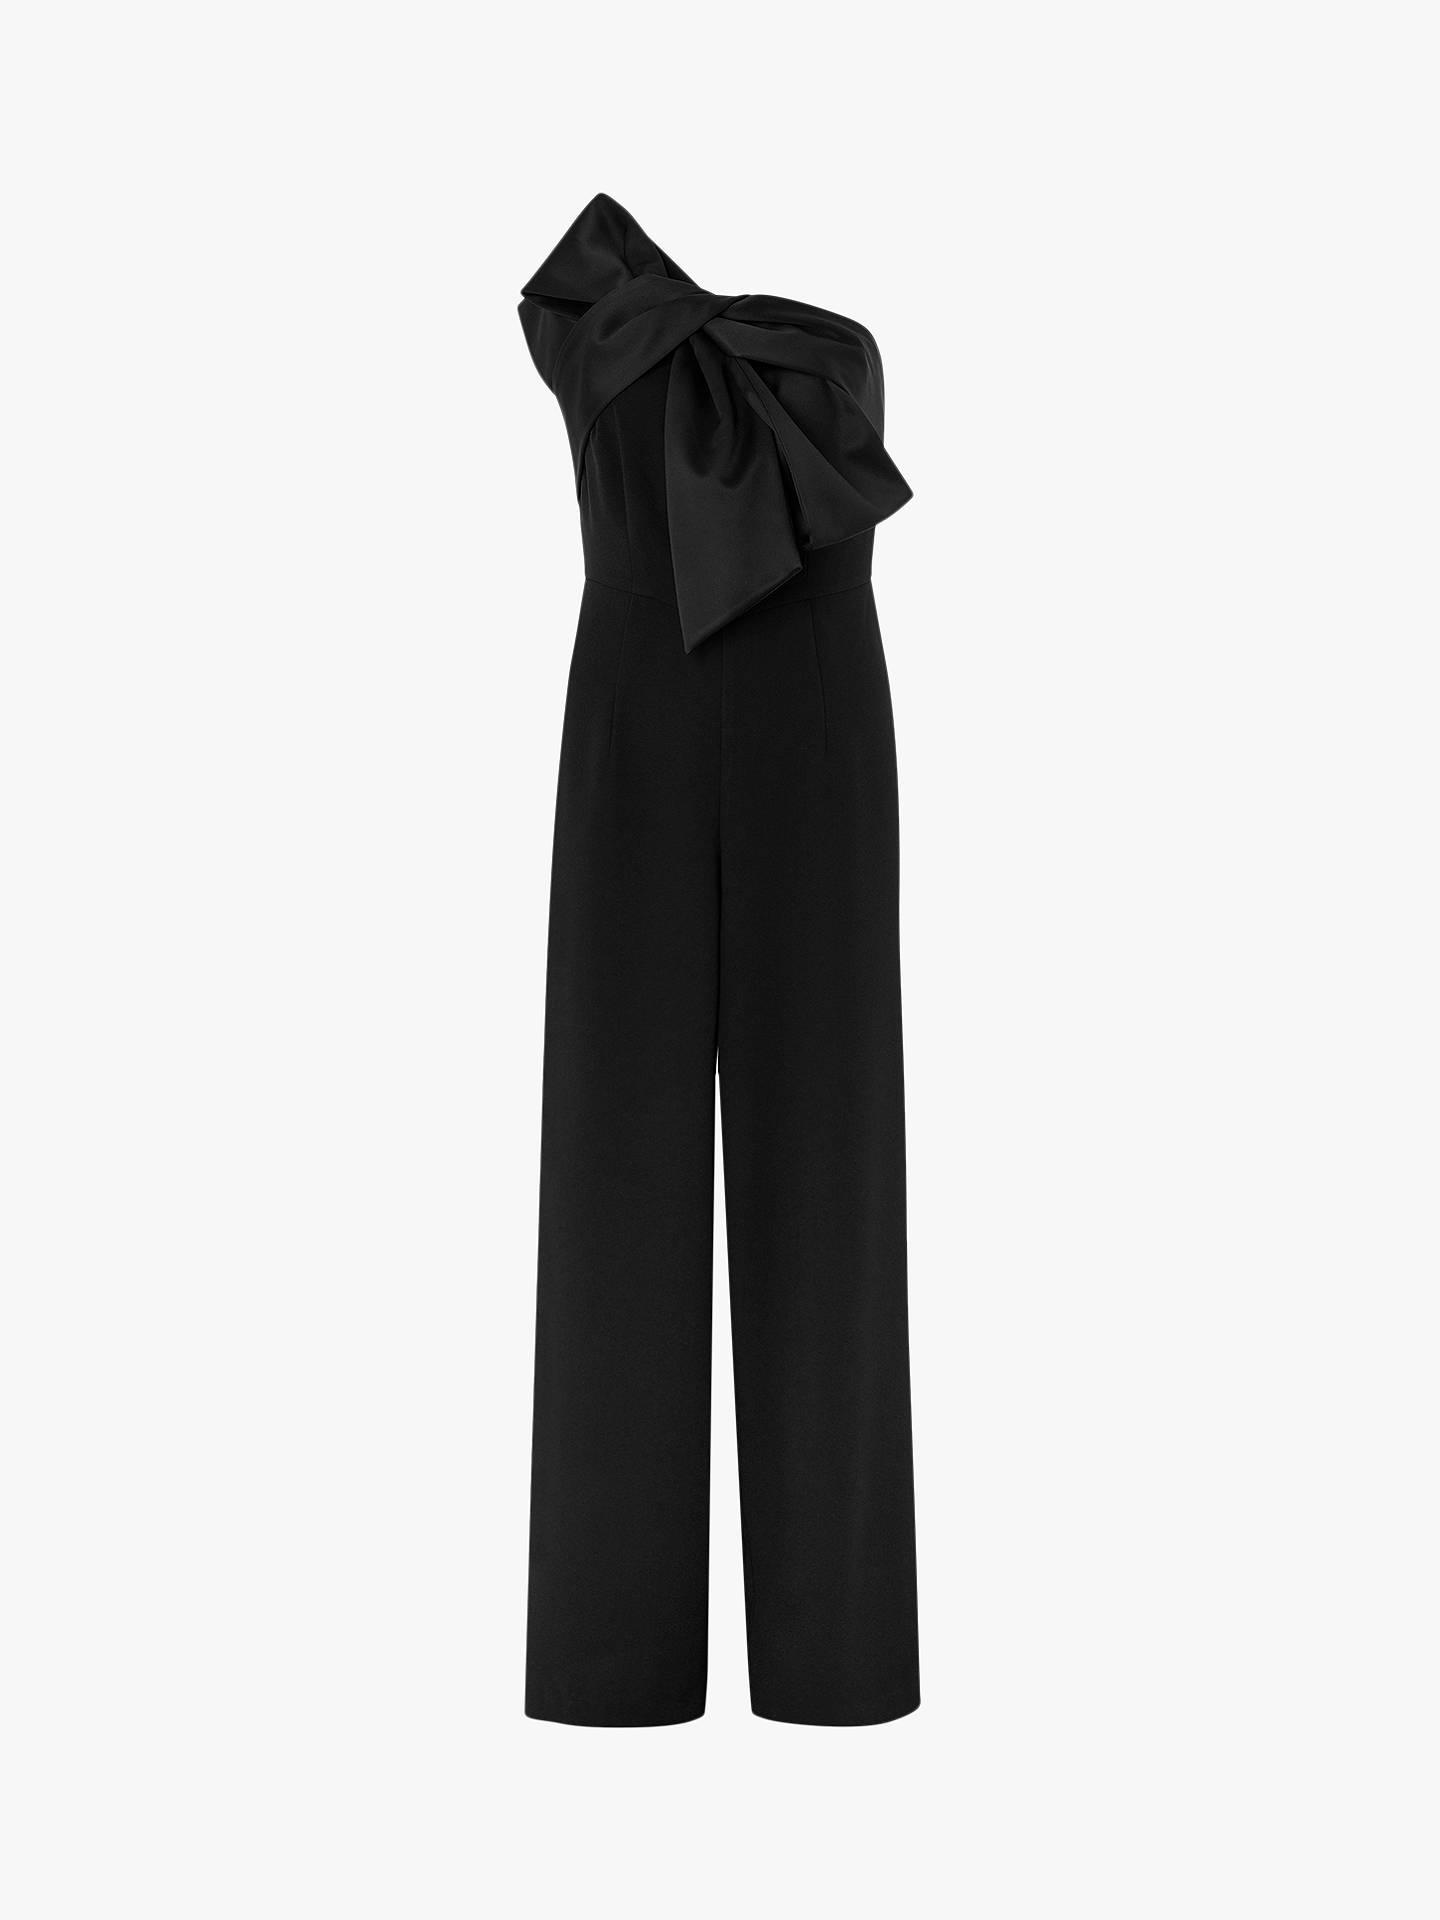 0b8a4e396a4 Zara Jumpsuit Black And White - Gomes Weine AG